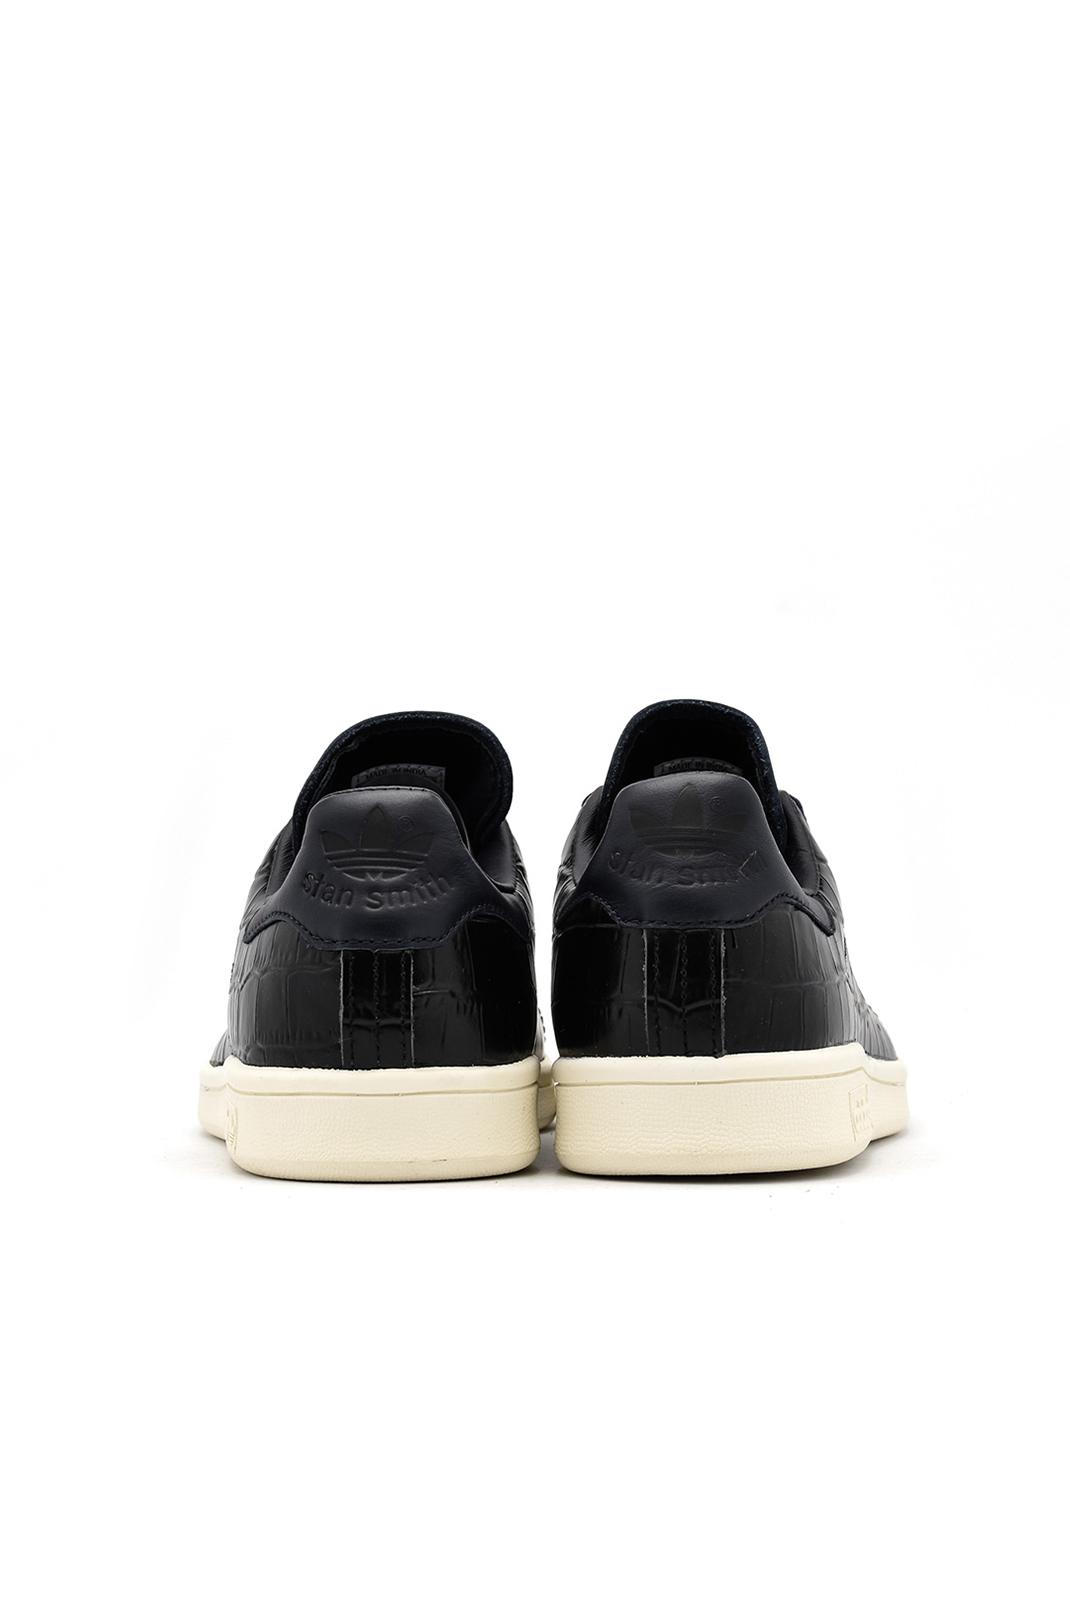 Baskets / Sneakers  Adidas BZ0453 STAN SMITH BLACK